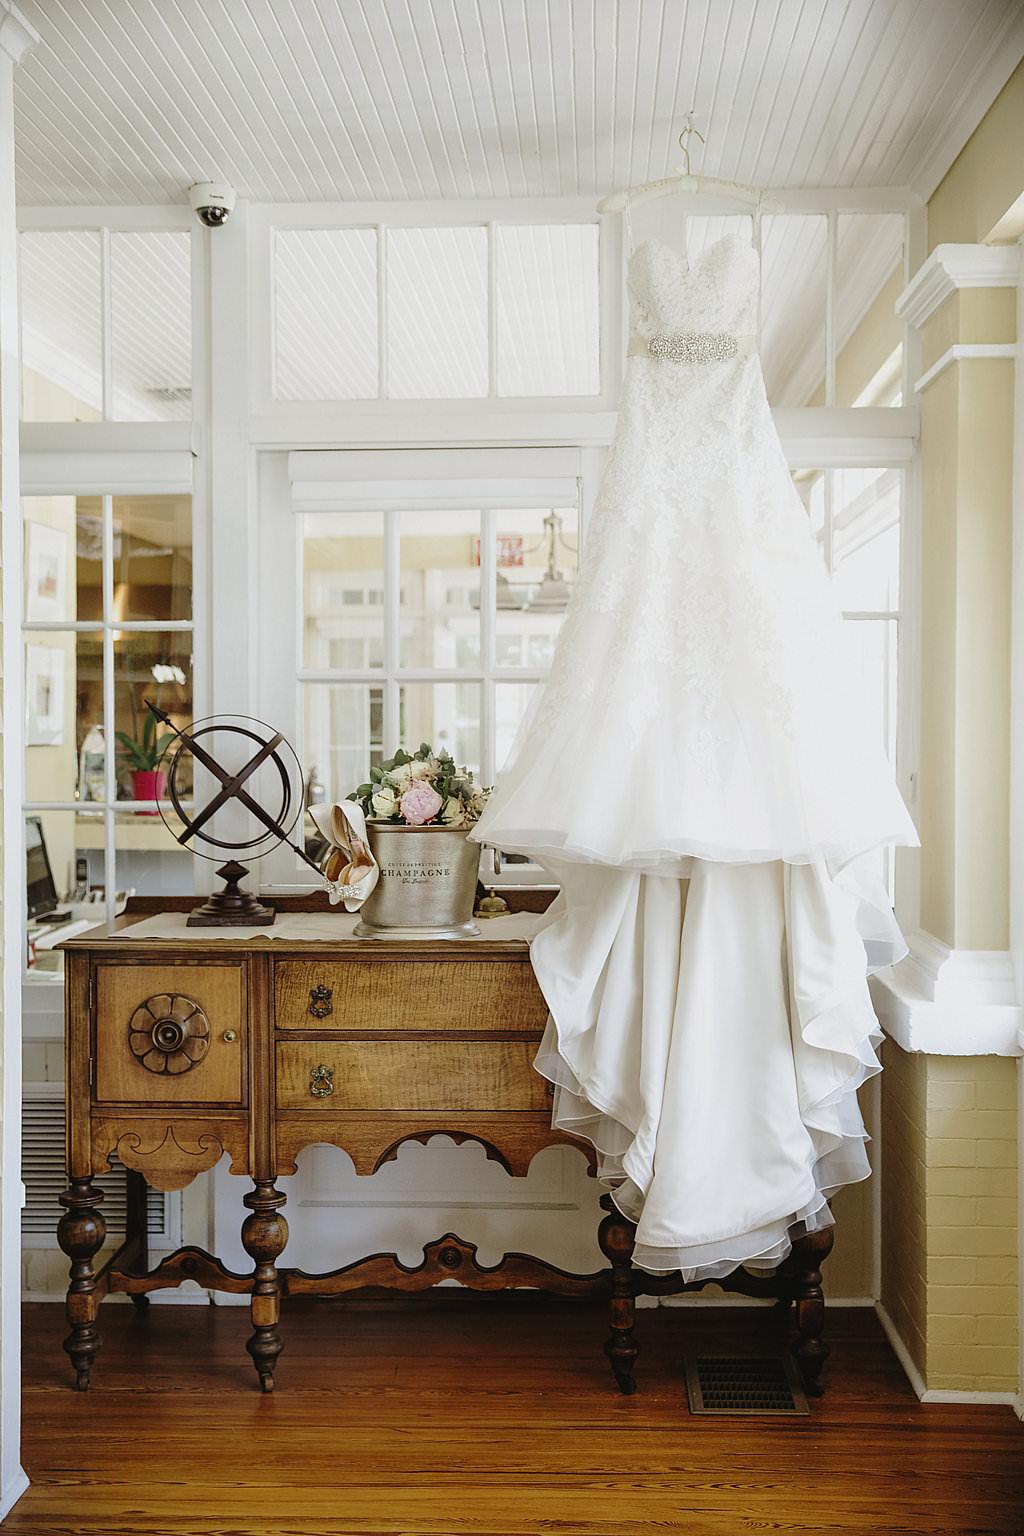 A-Line Belted Sweetheart Wedding Dress on Hanger